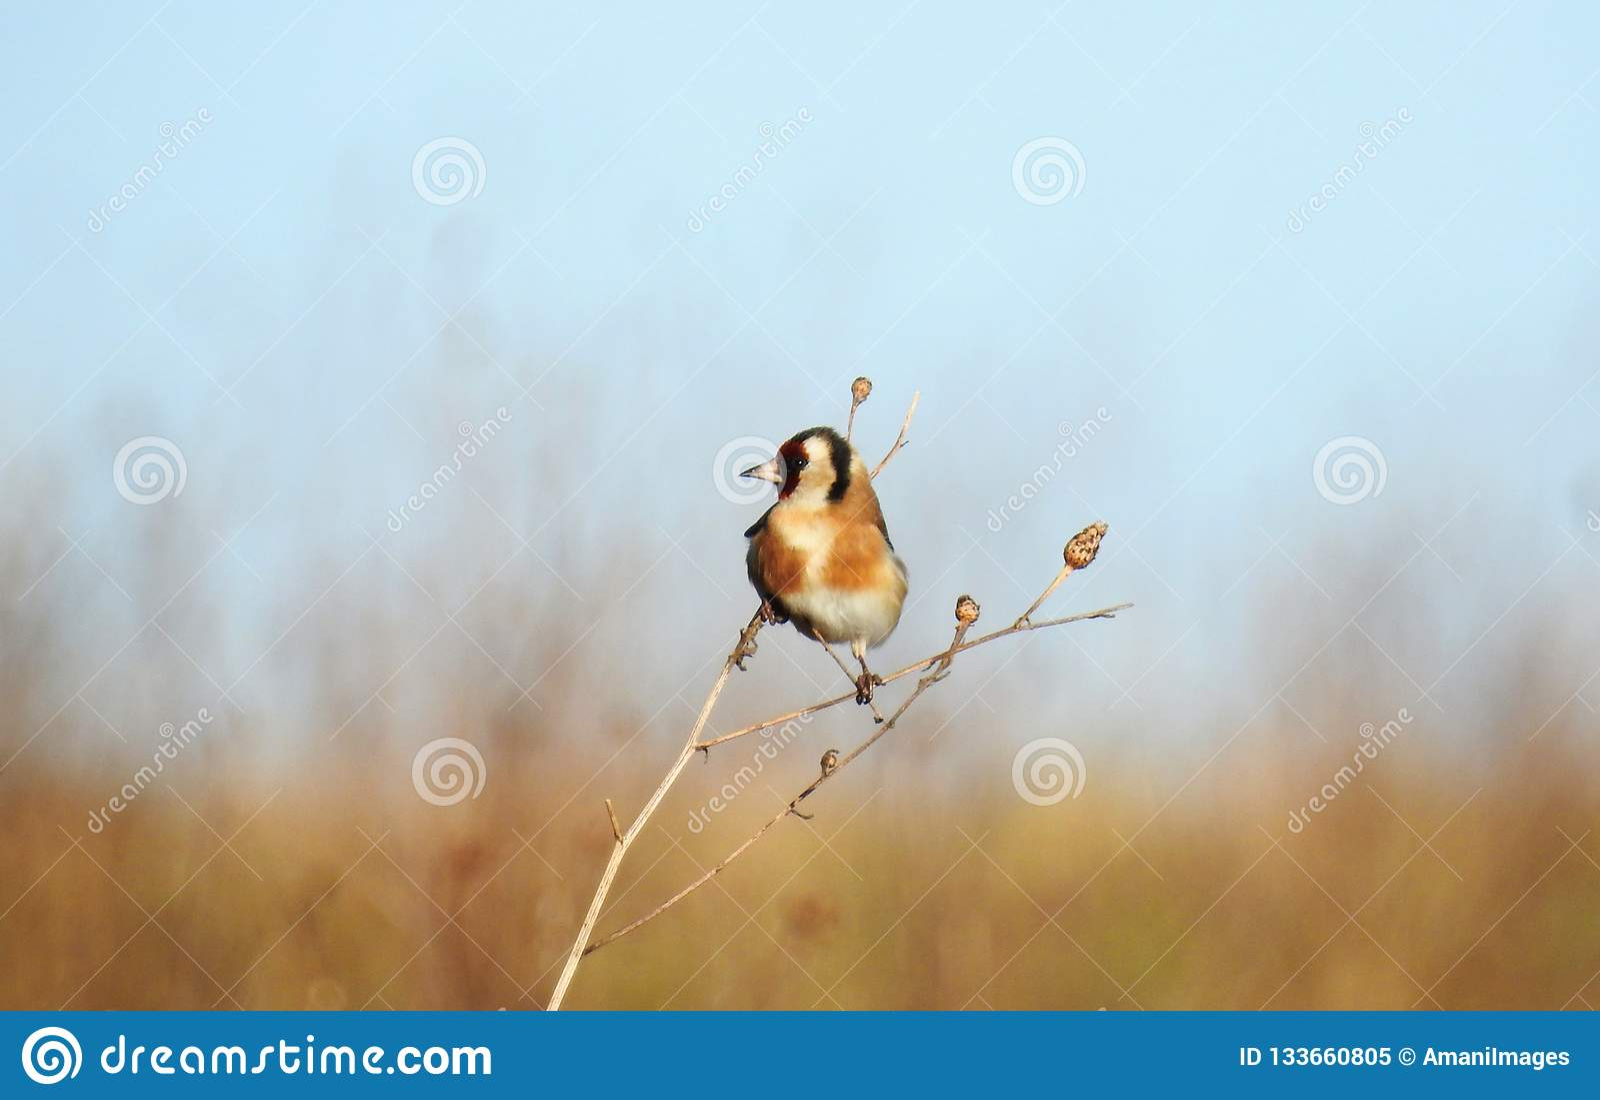 A European Goldfinch bird Carduelis carduelis